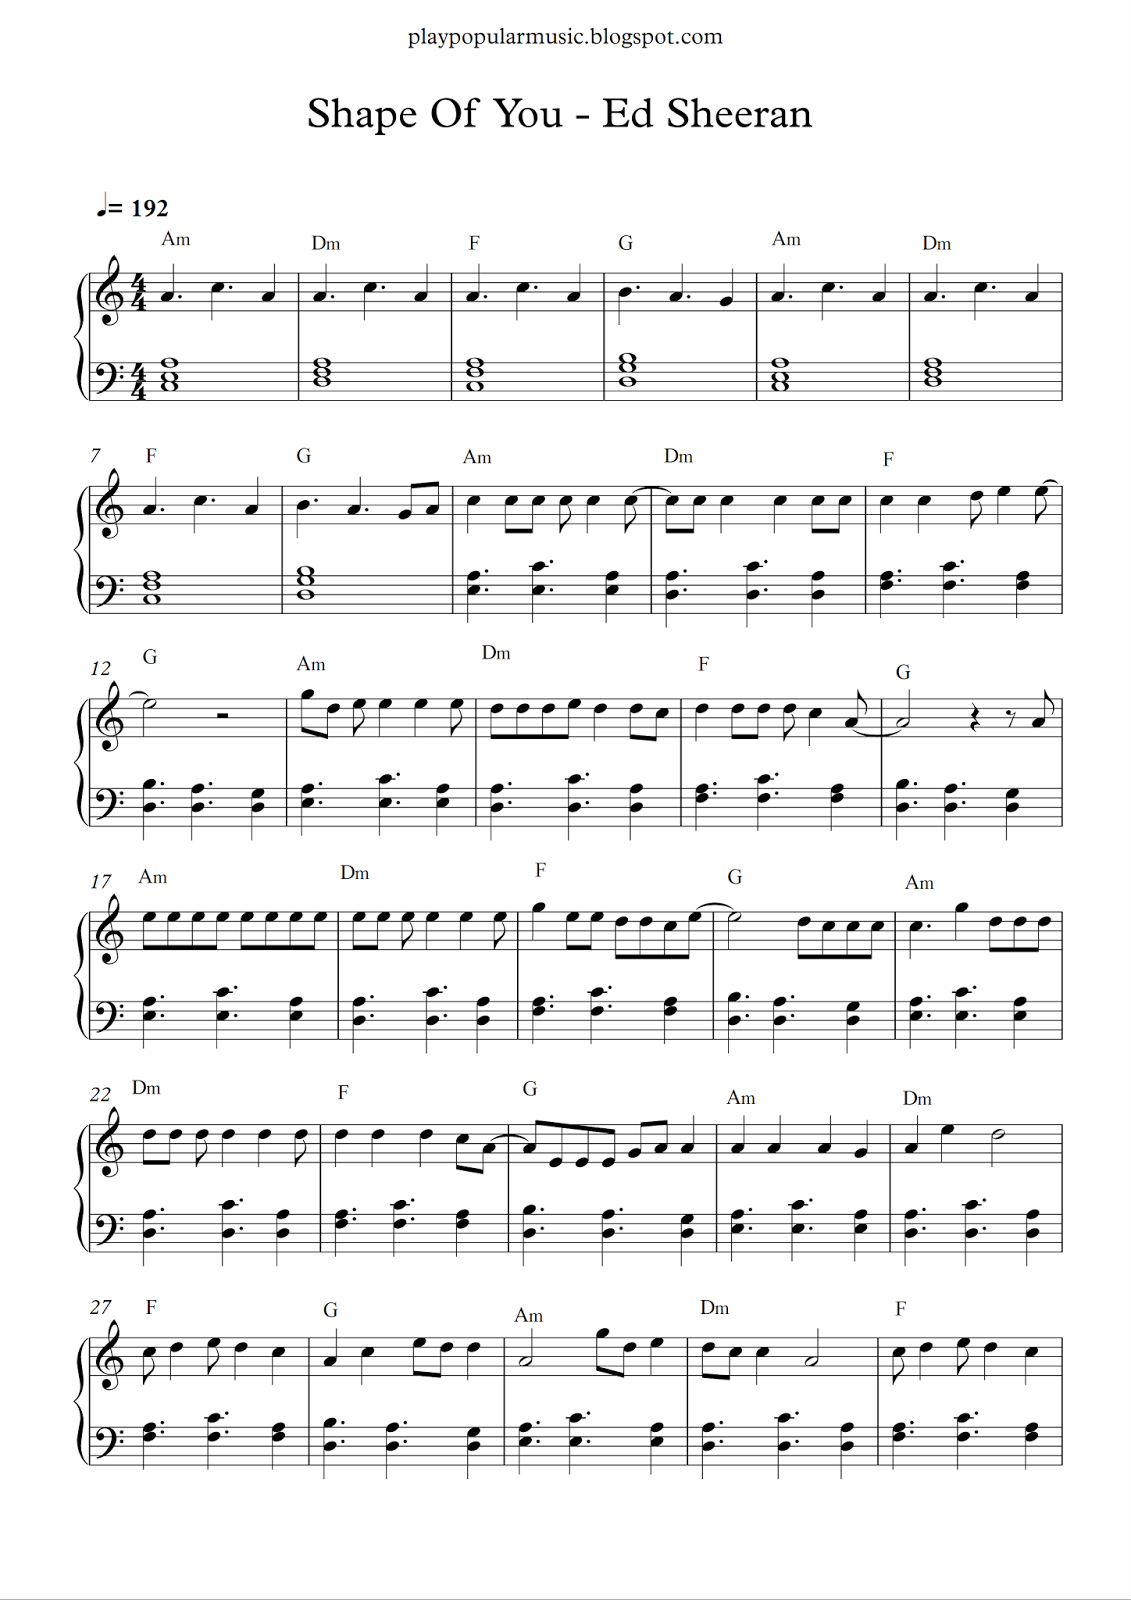 Free Piano Sheet Music: Shape Of You-Ed Sheeran.pdf Your Love Was - Free Printable Music Sheets Pdf